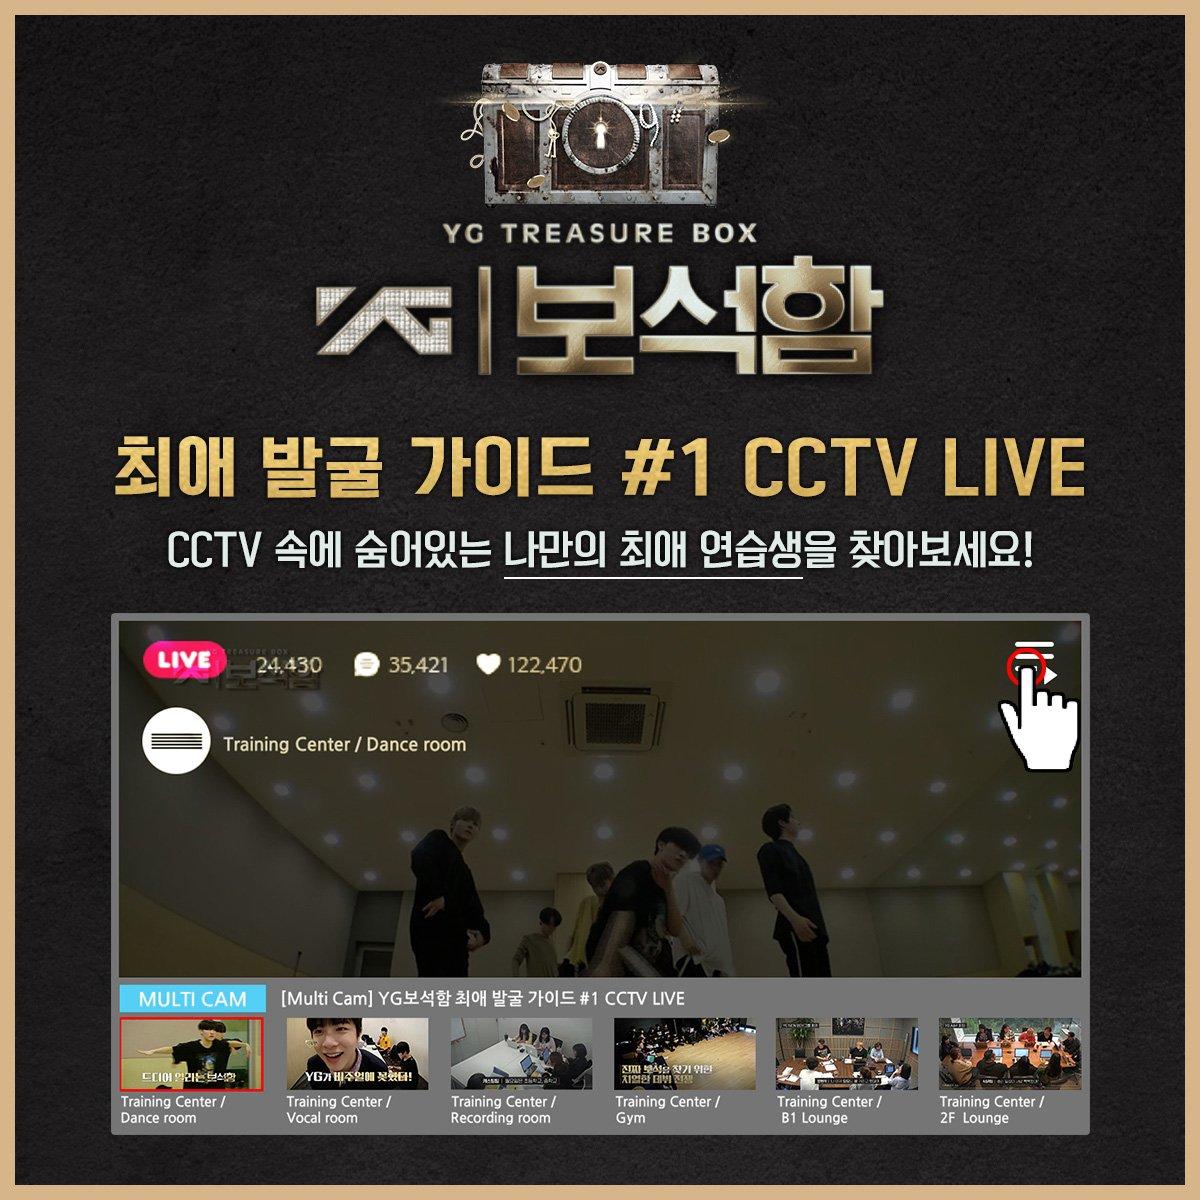 YG 보석함 | 최애 발굴 가이드#1 <CCTV LIVE>  YG 트레이닝 센터와 연습생들의 숙소에 설치된 9대의 CCTV 영상을 11월 16일 밤 8시부터 10시까지, 2시간 동안 전격 공개합니다!     _첫방#YG보석함송#YG_TREASURE_BOX #CCTVLIVE #YG보석함_첫방송 #VLIVE_10PM#JTBC2_YOUTUBE_MIDNIGHT#YG